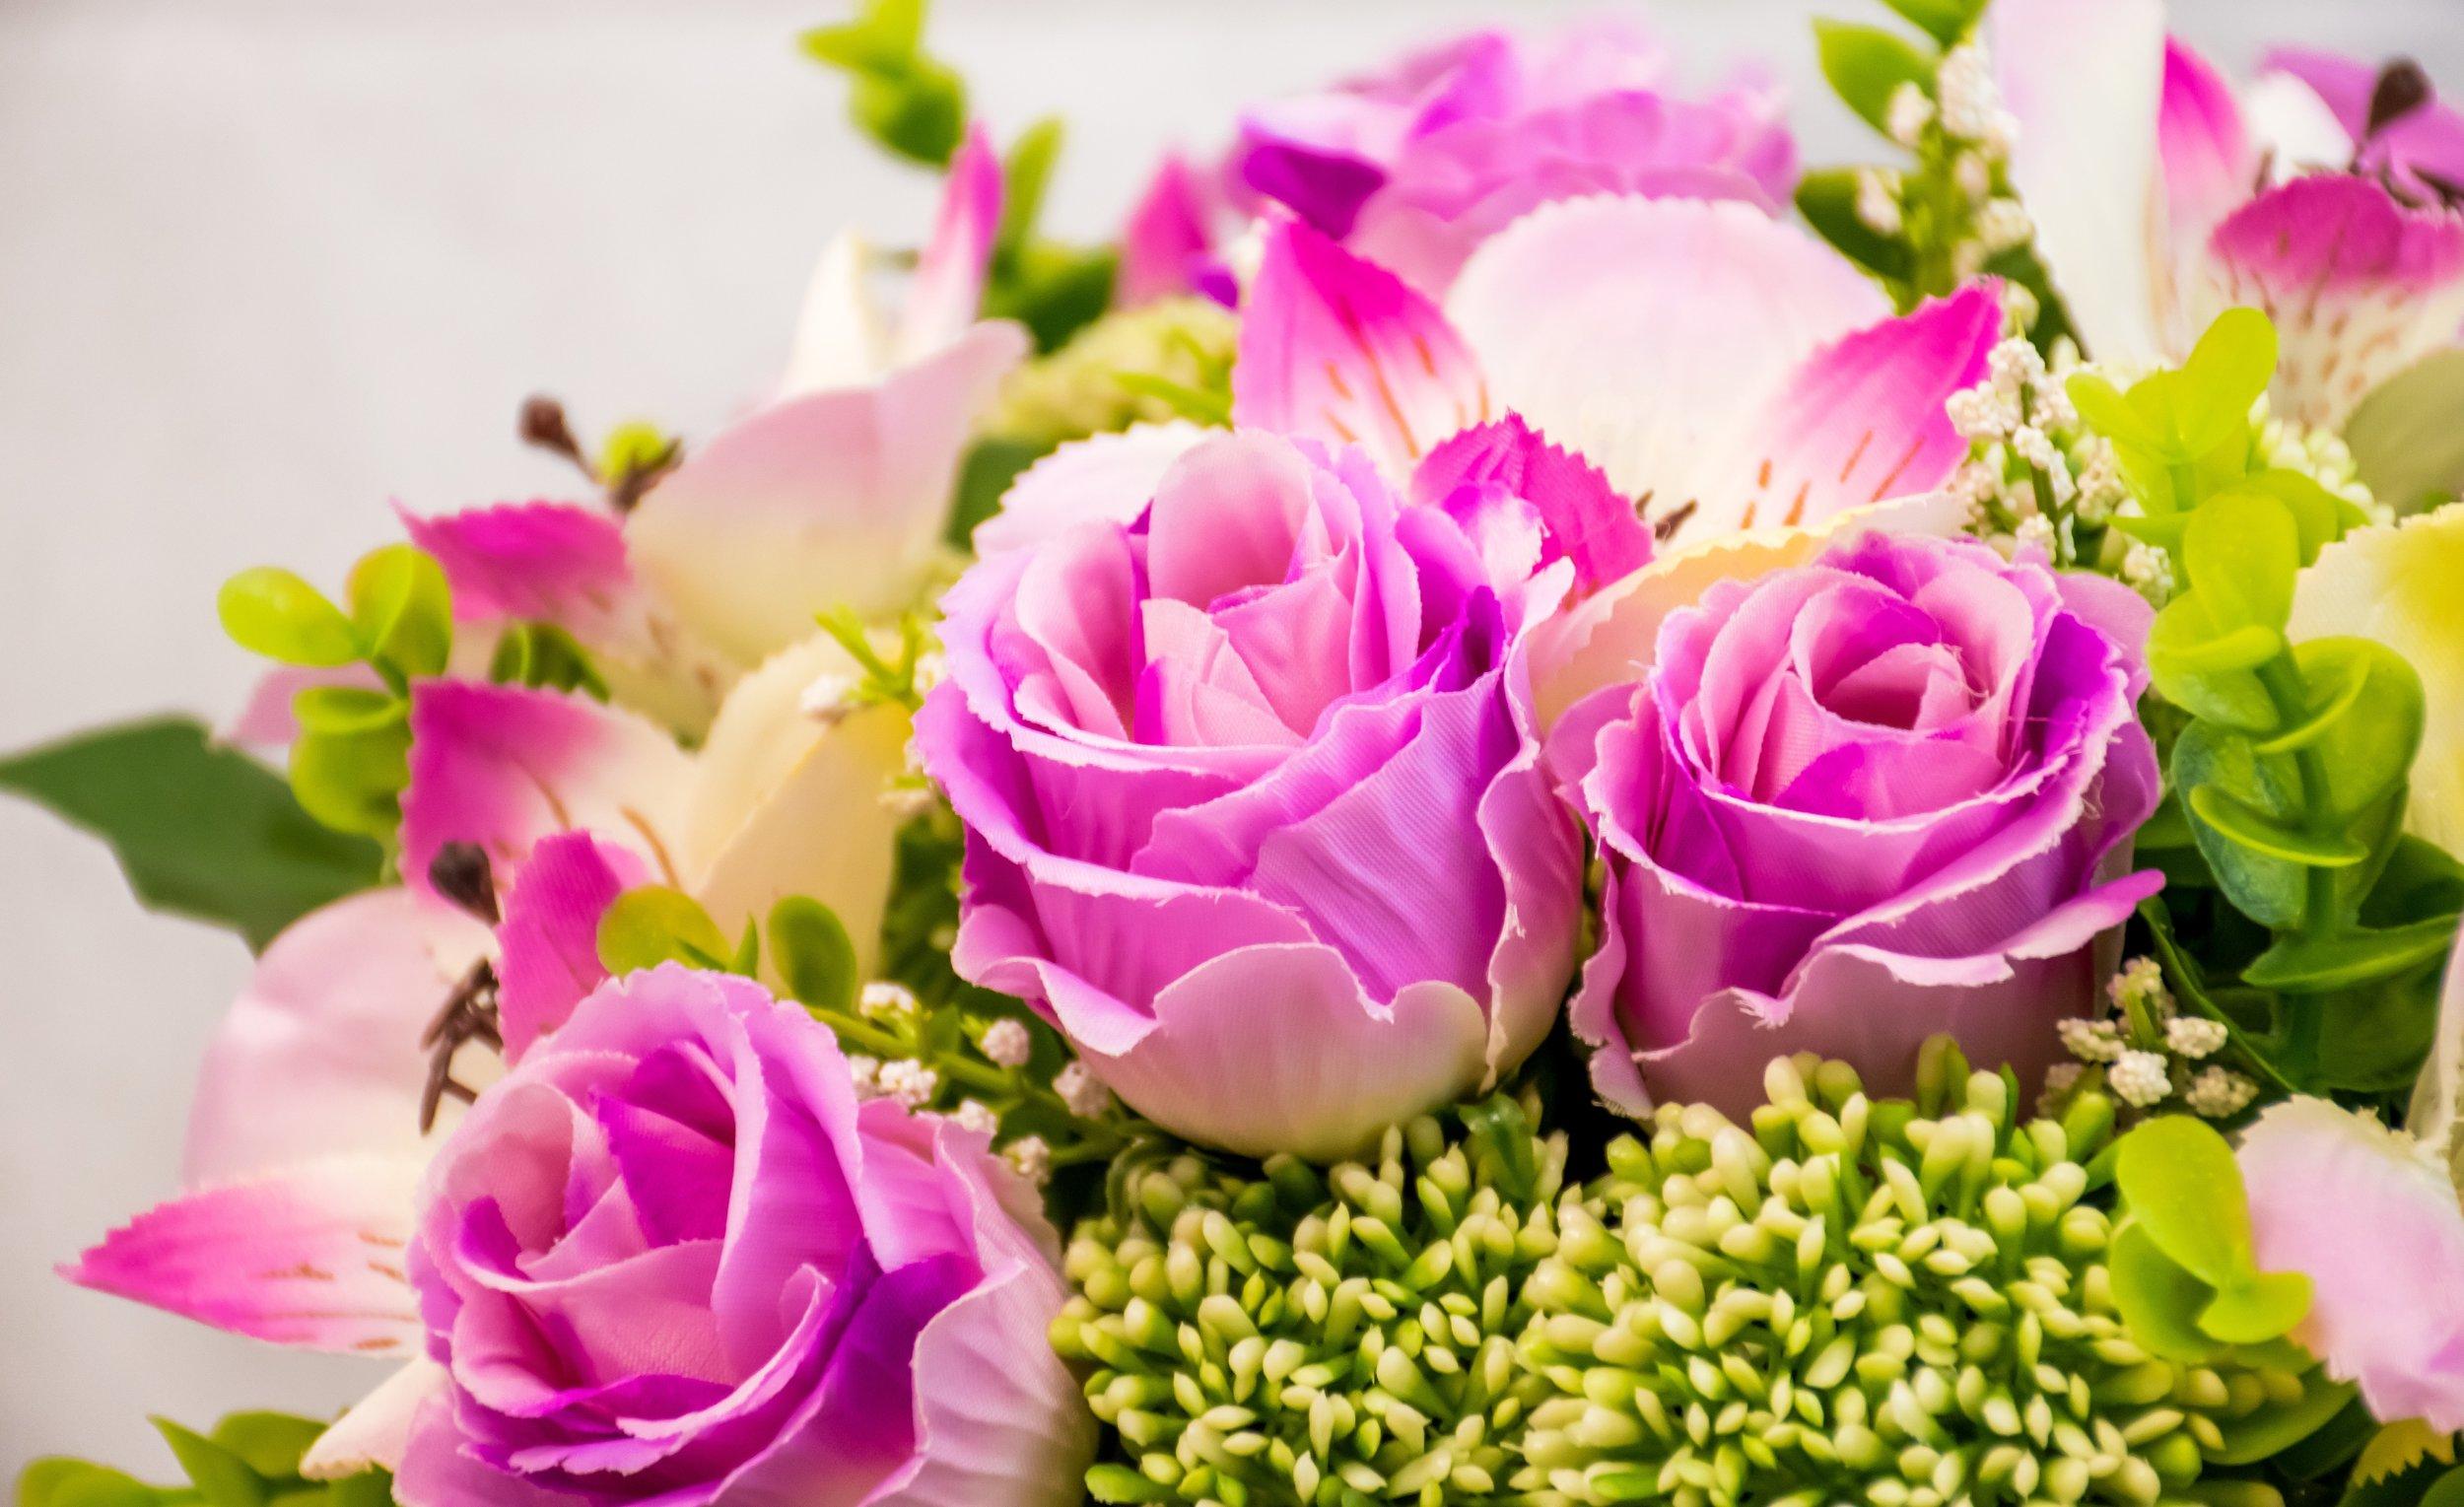 bloom-blossom-bouquet-135224.jpg